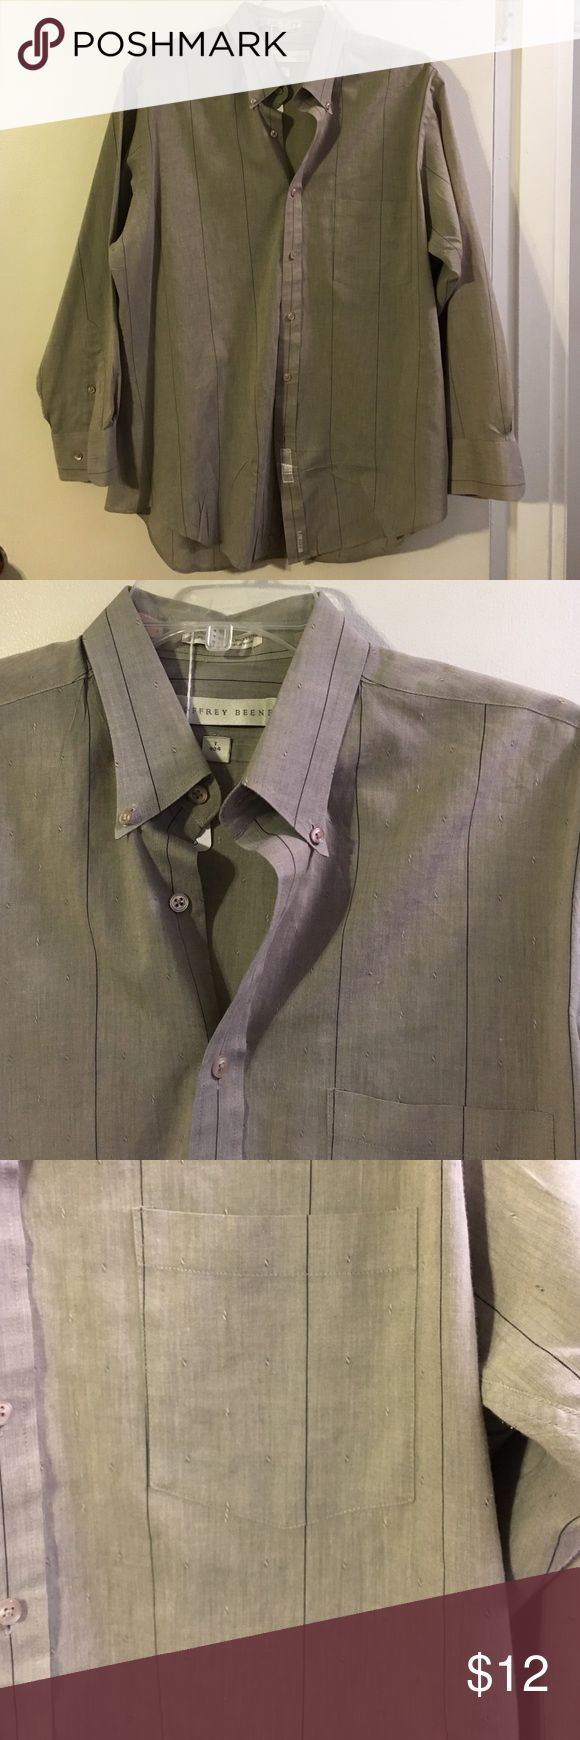 Geoffrey Beene gray w/black pinstripe men's shirt Cotton/poly. L Geoffrey Beene Shirts Dress Shirts